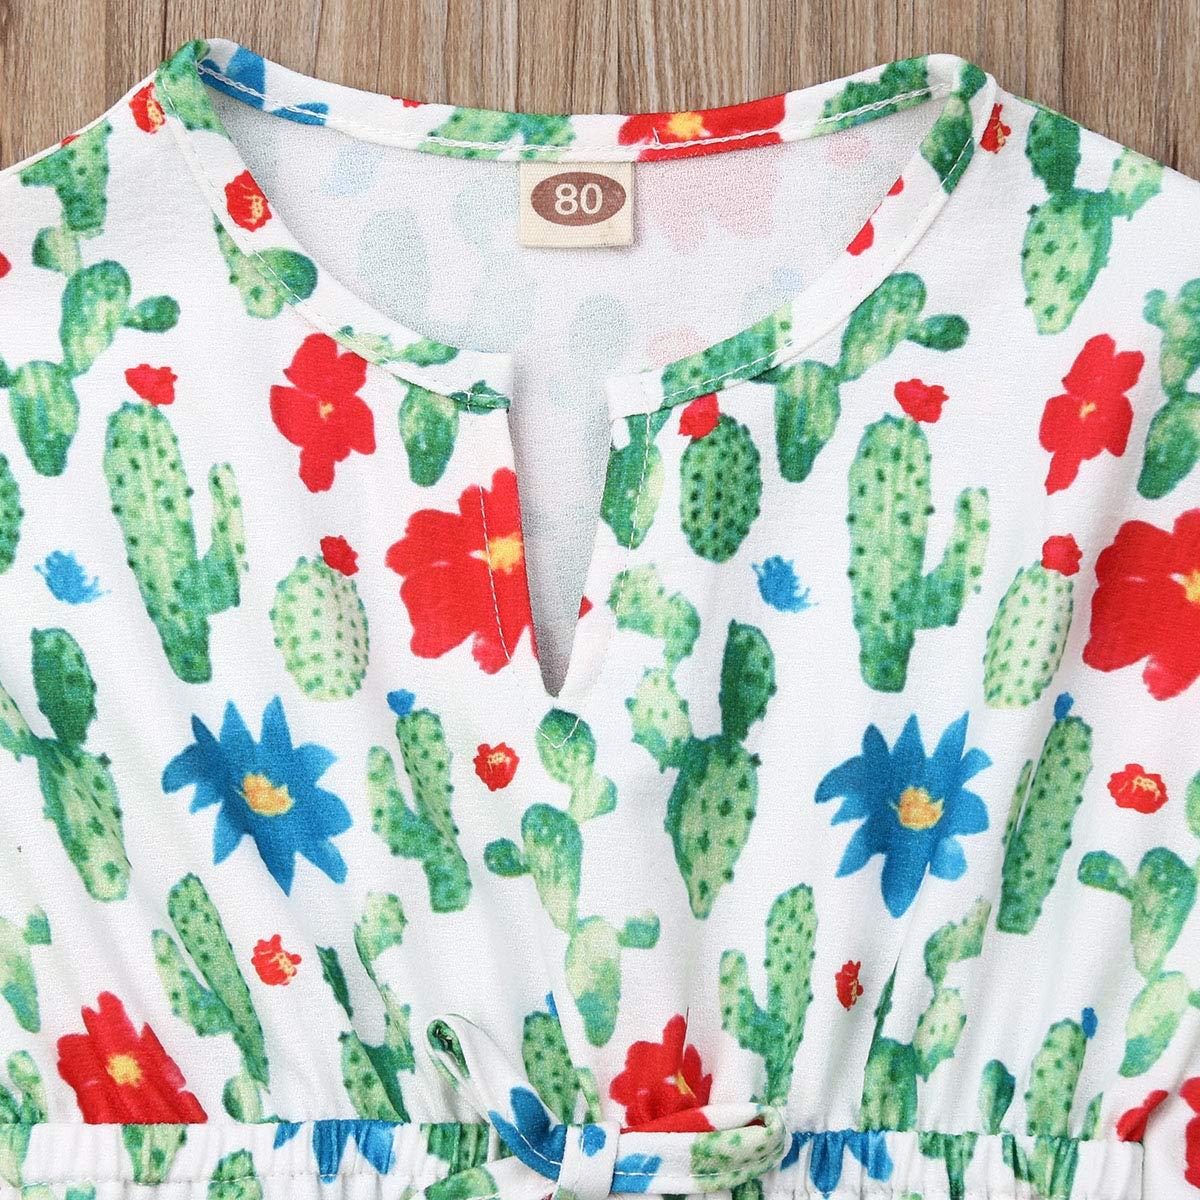 Koloyooya Fashion Toddler Baby Girls Swimwear Cover-Up Sundress Swimsuit Poncho Wraps Beach Dress Tops.